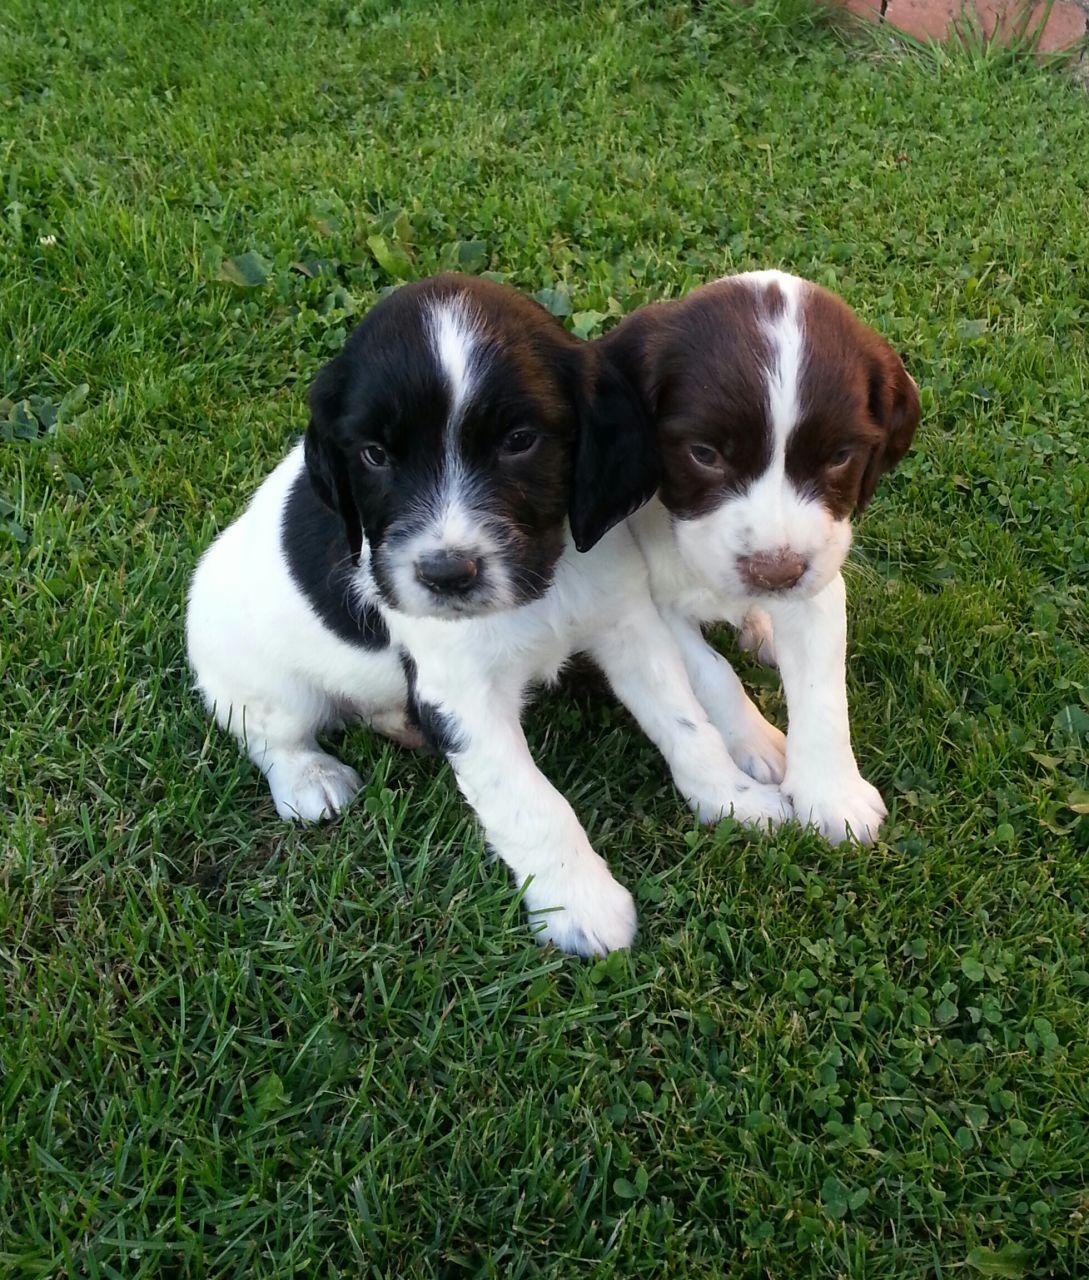 English Springer Spaniel Puppies: English Springer Spaniel Puppies Breed